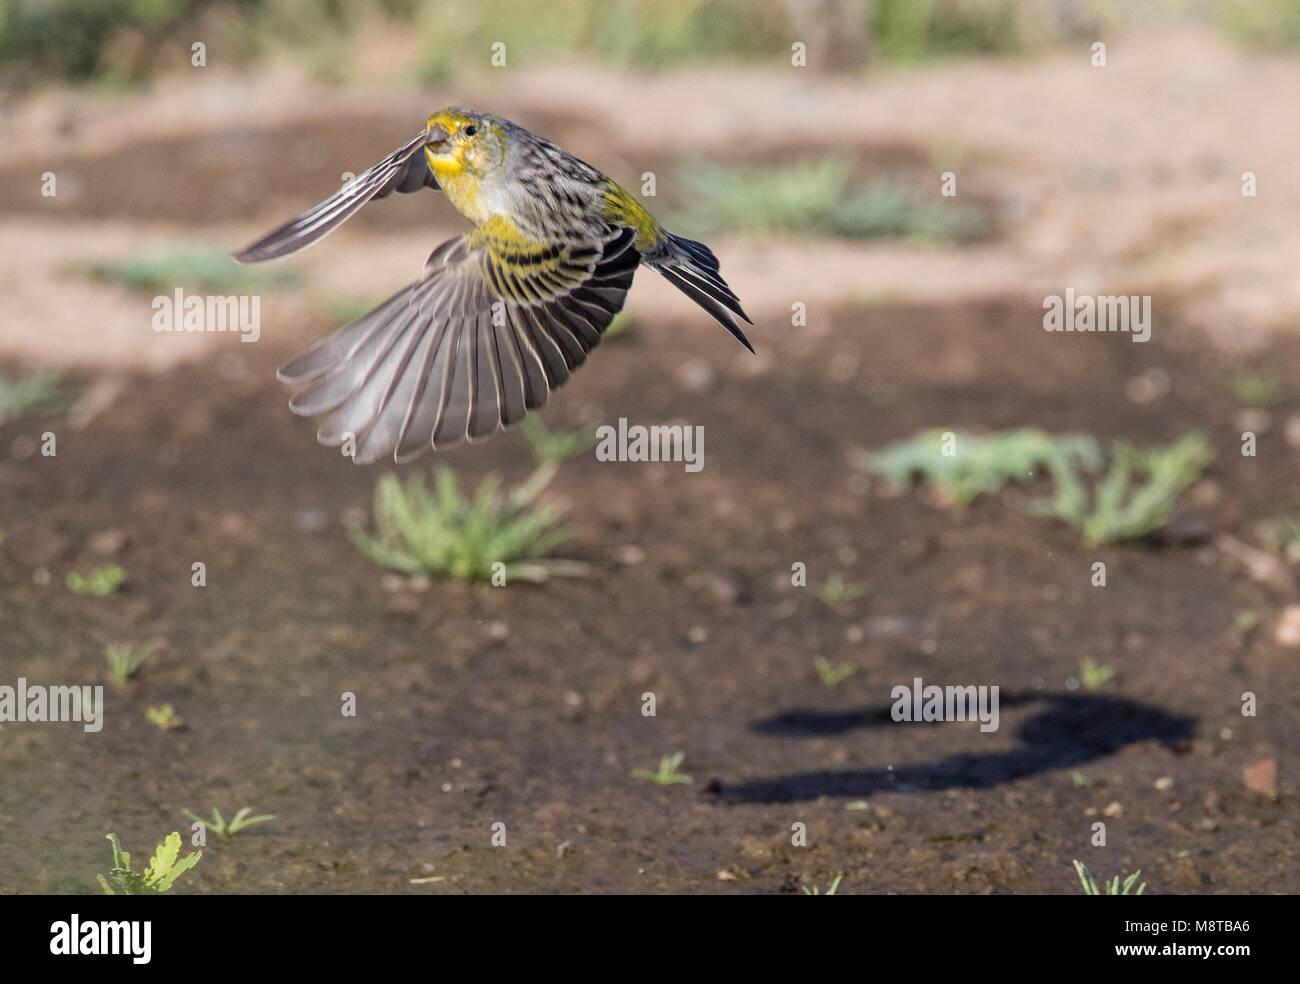 Atlantic Canary in flight - Stock Image